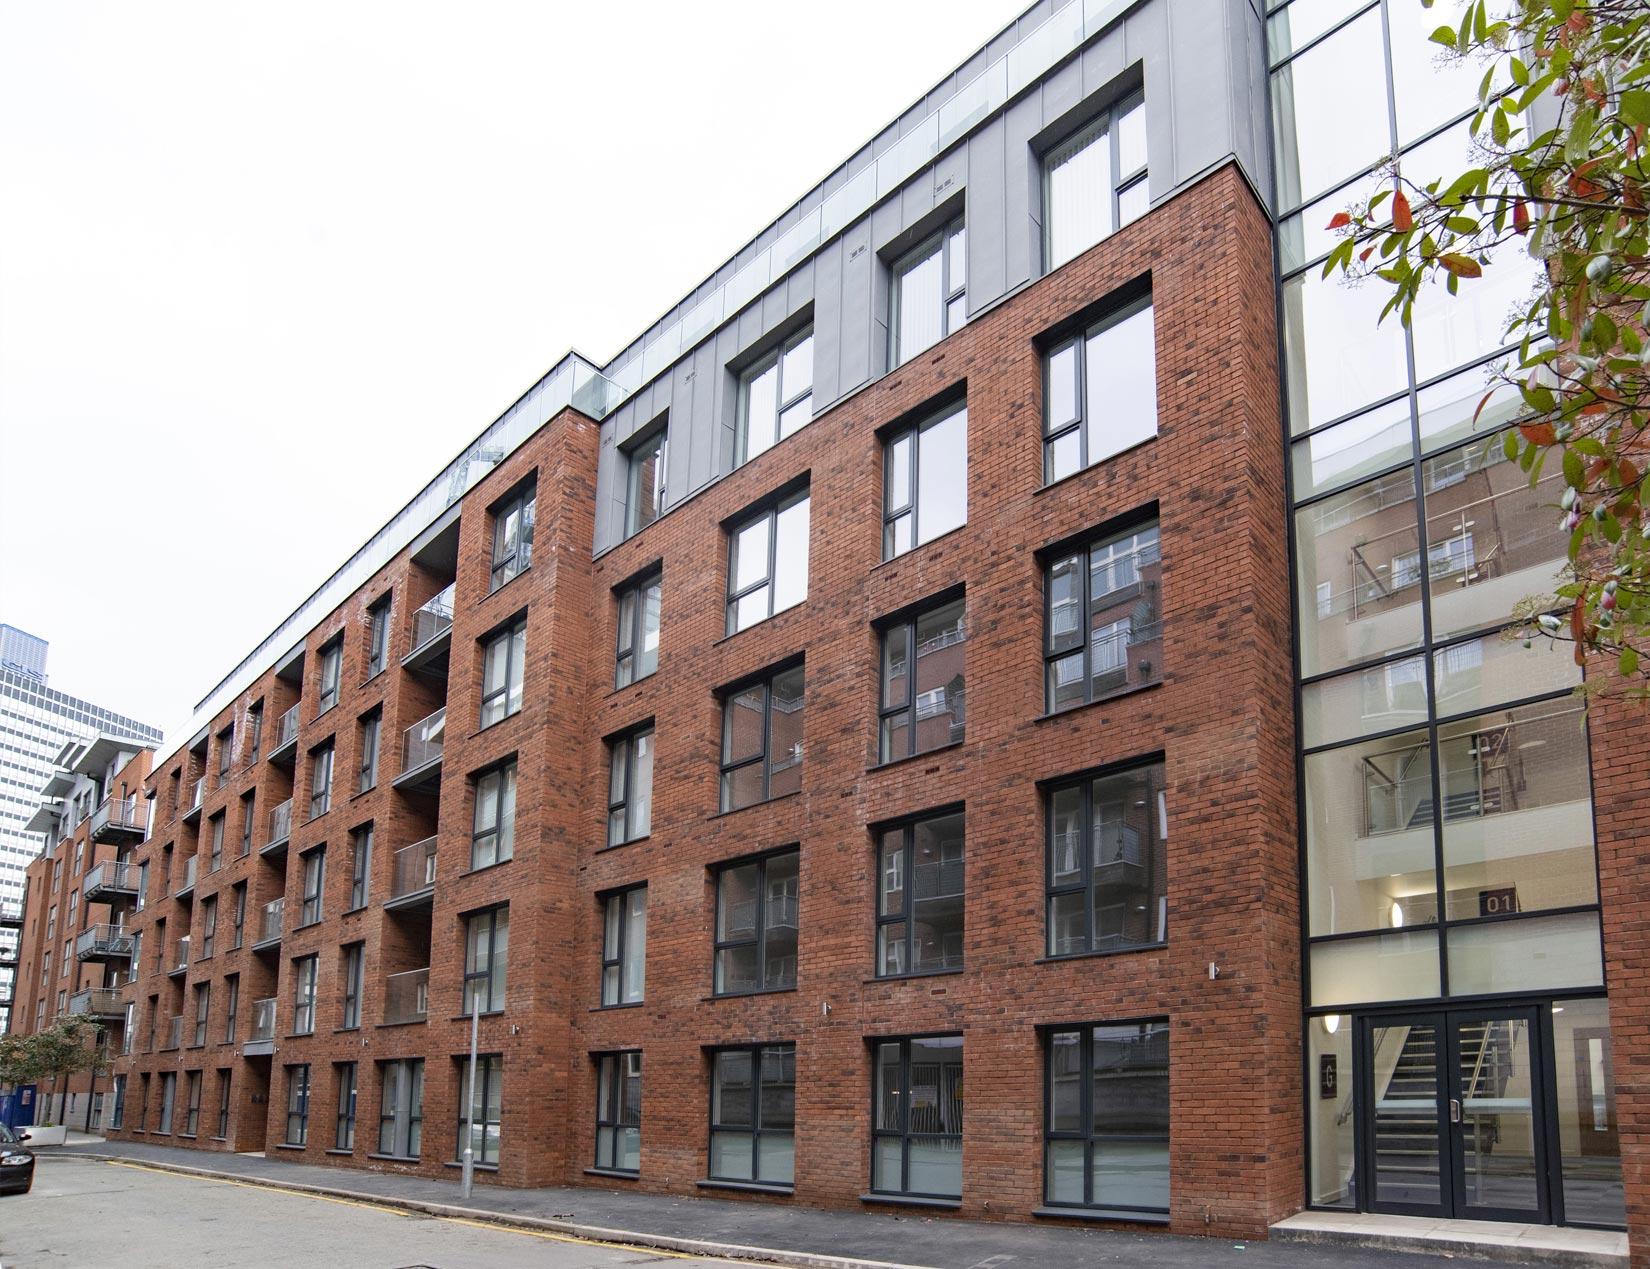 Halo, Simpson Street, Manchester, Façade